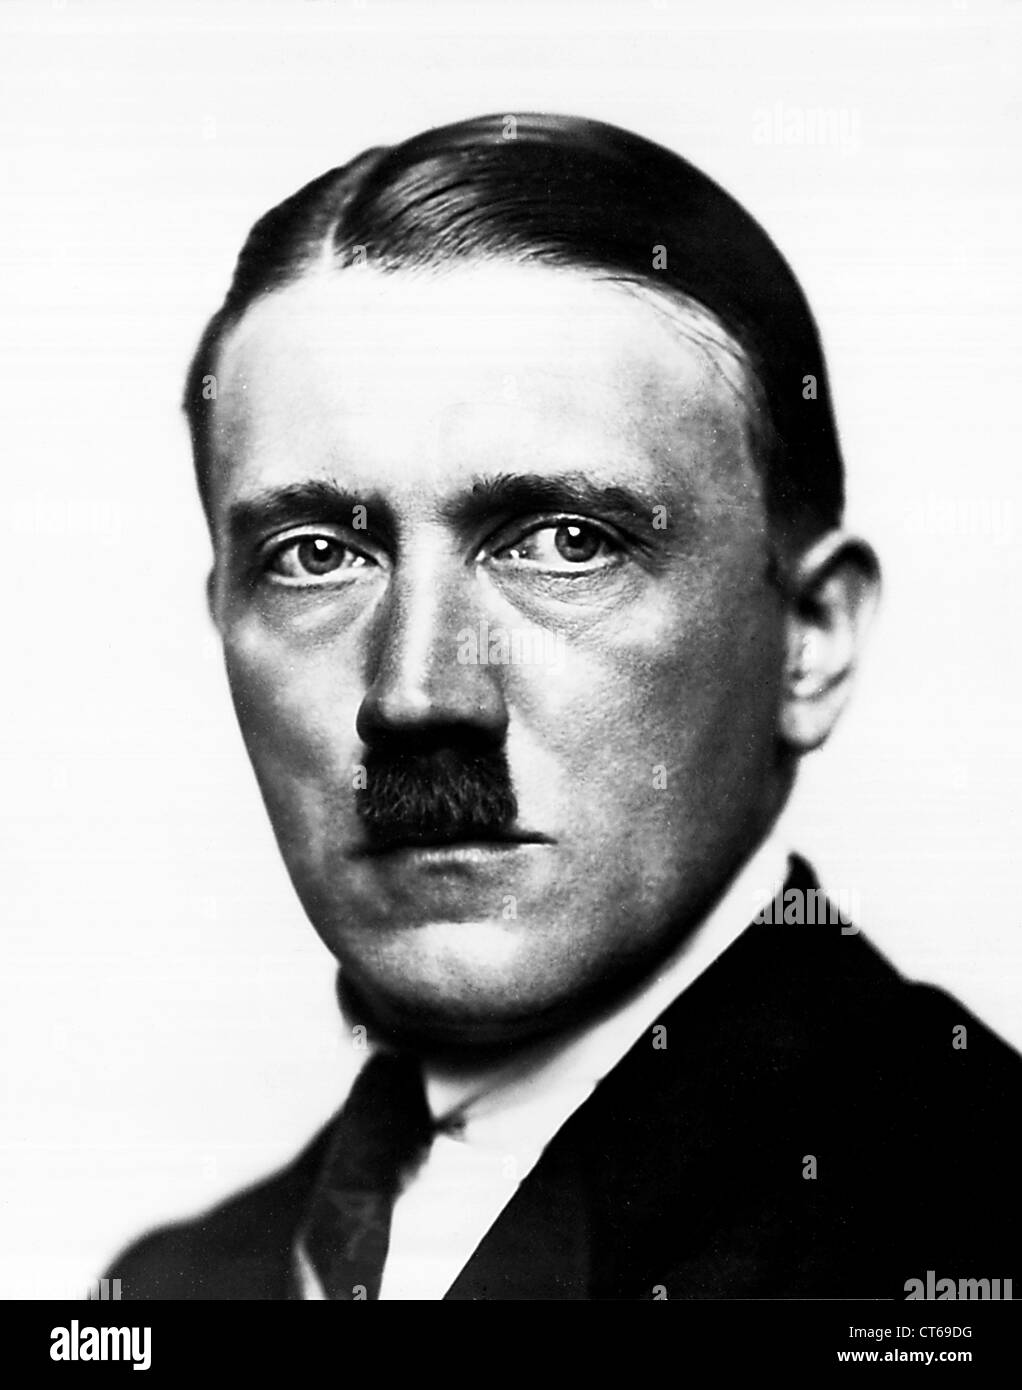 Portrait of Adolf Hitler - Stock Image